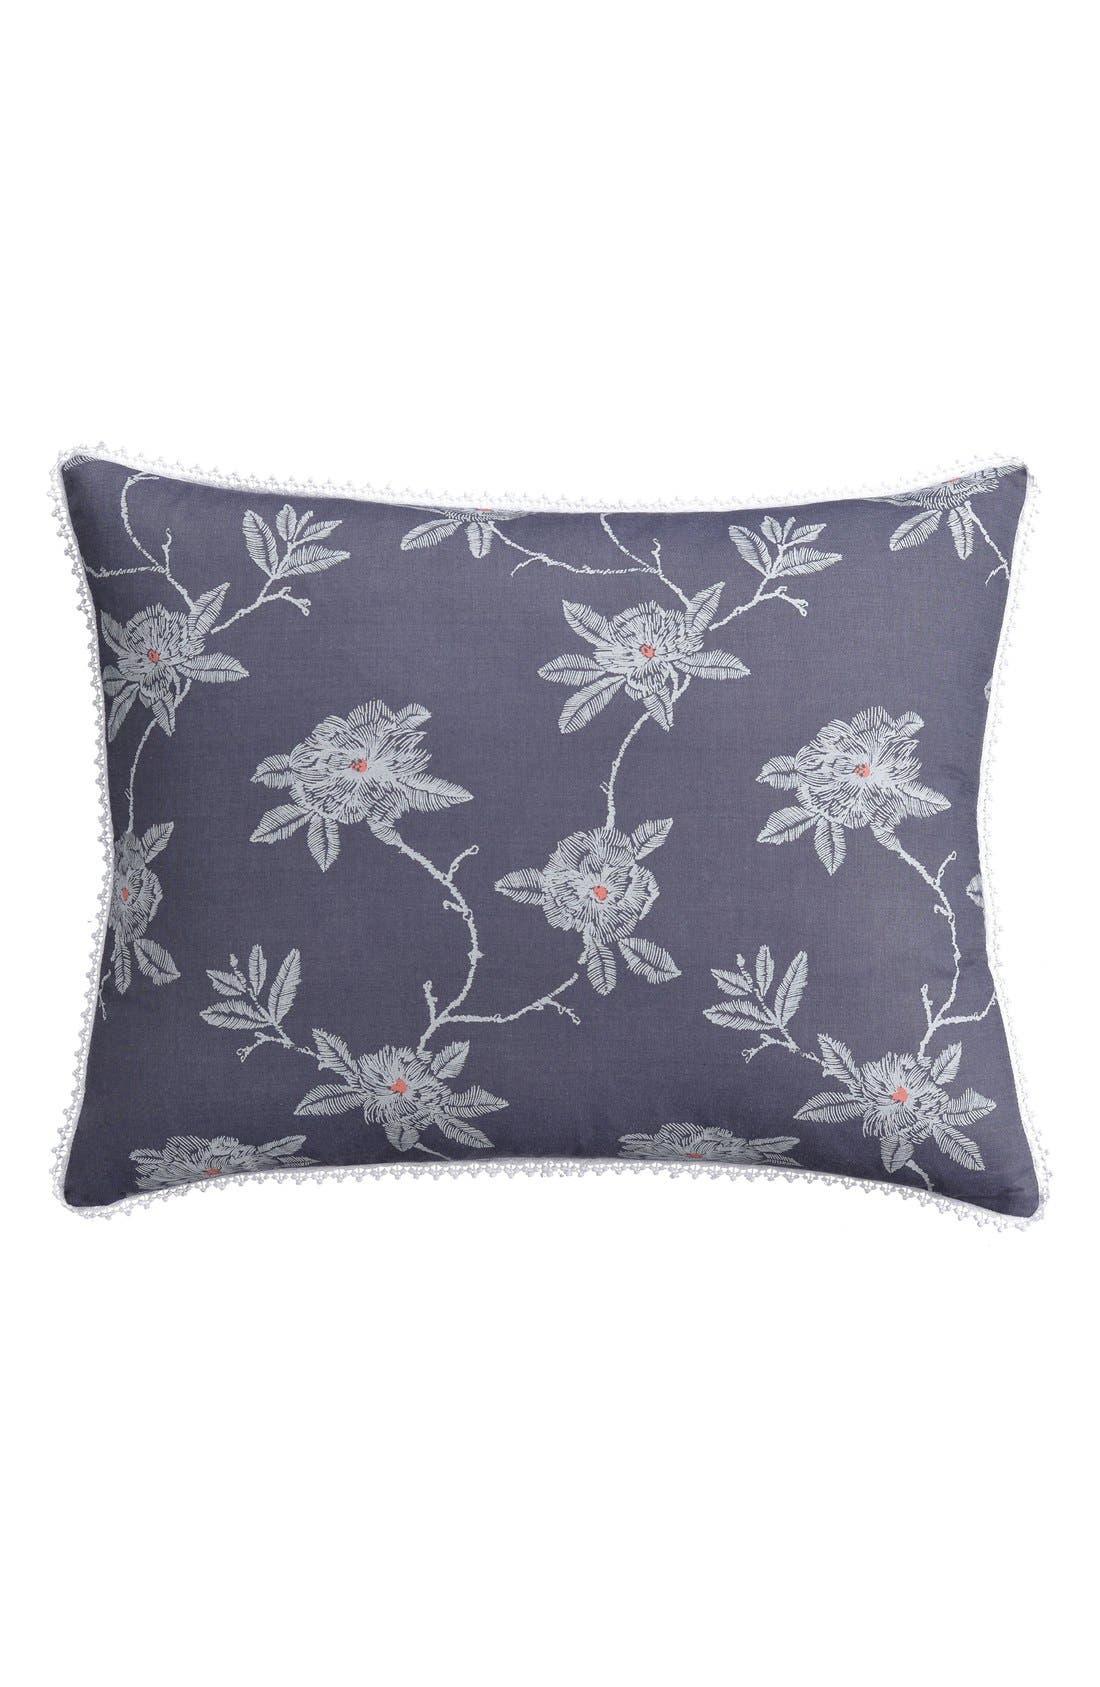 'Sketch' Floral Print Sham,                         Main,                         color, Blue